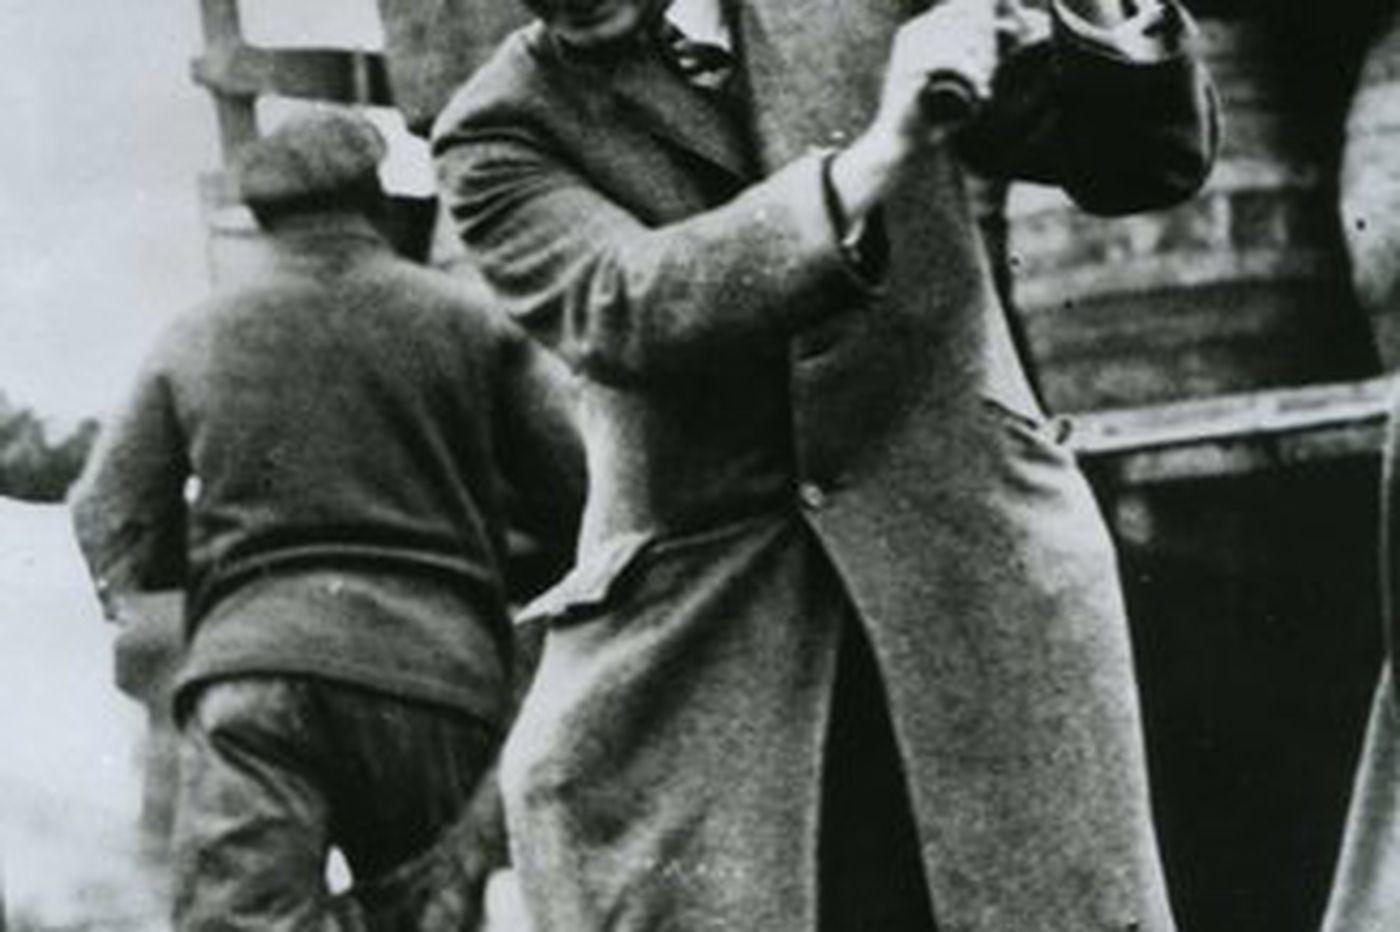 Raising a toast on anniversary of Prohibition